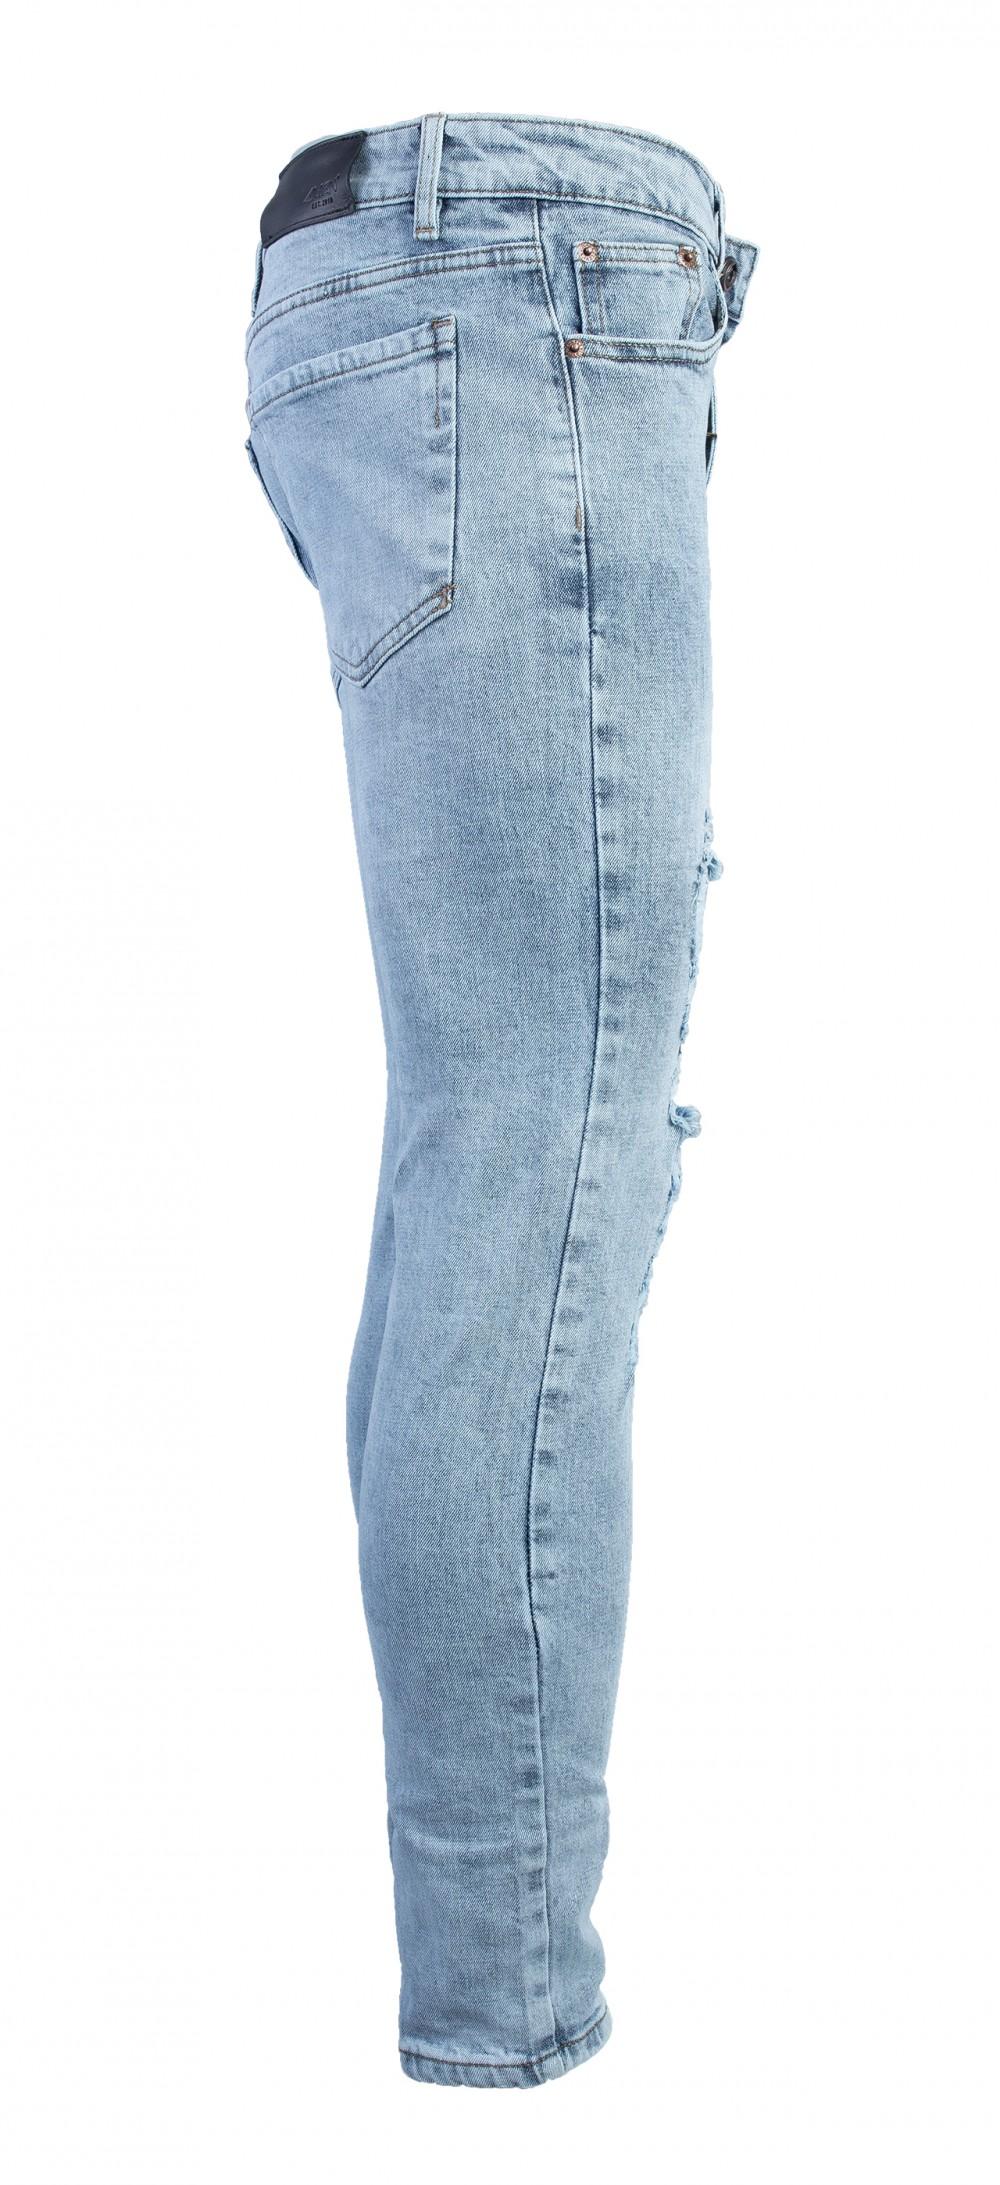 Quan Jeans Rach Xanh QJ1562